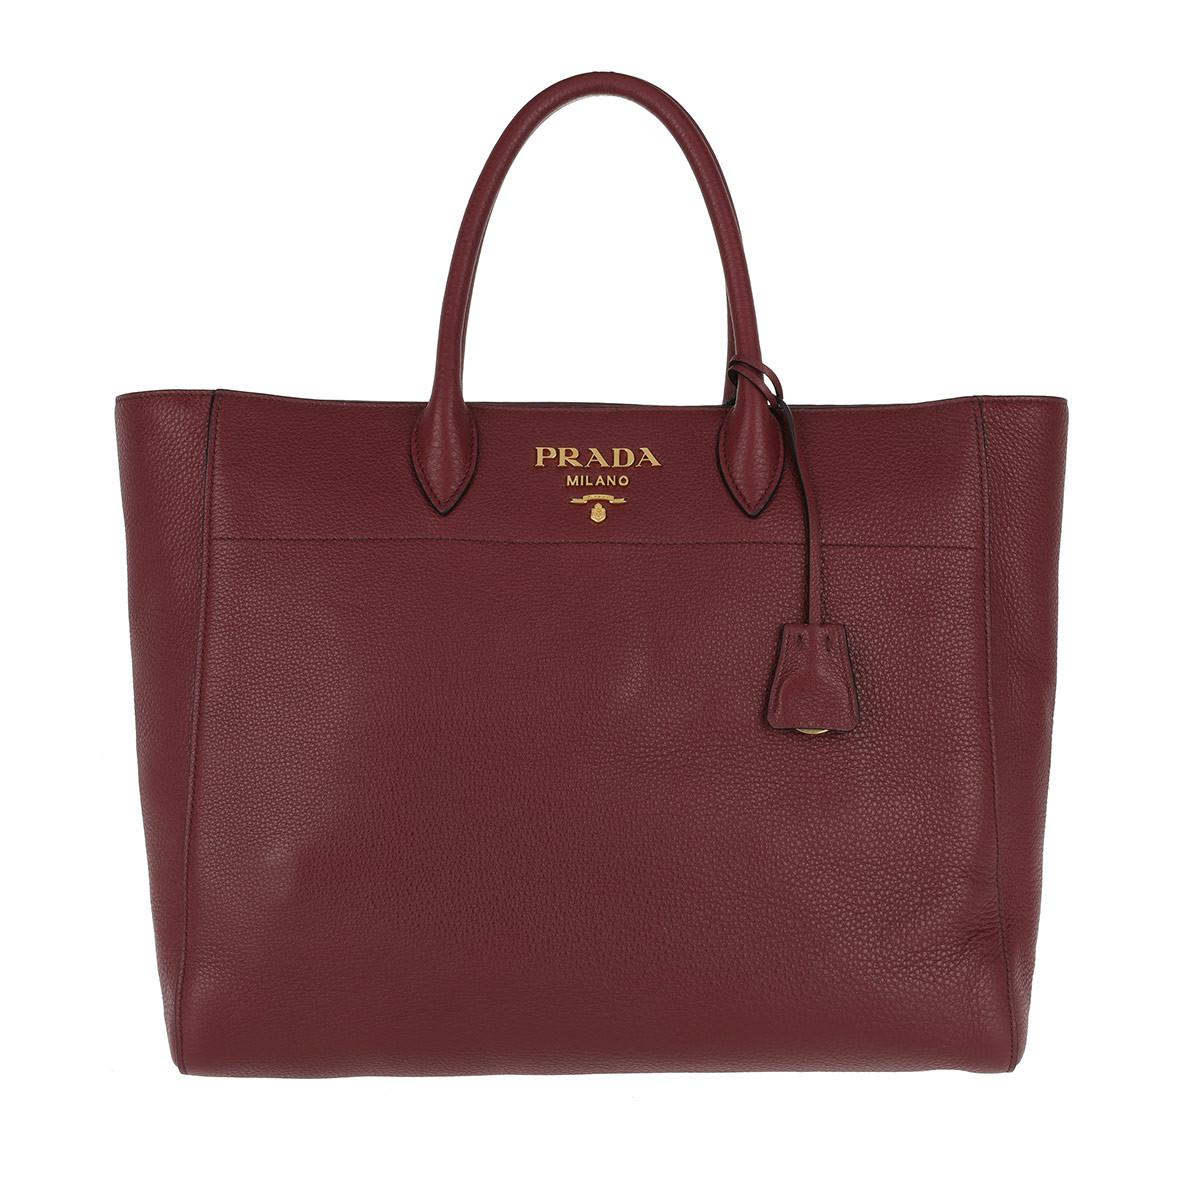 9edcca4219a1 Prada Shopping Bag Saffiano Leather Cerise in Red - Lyst